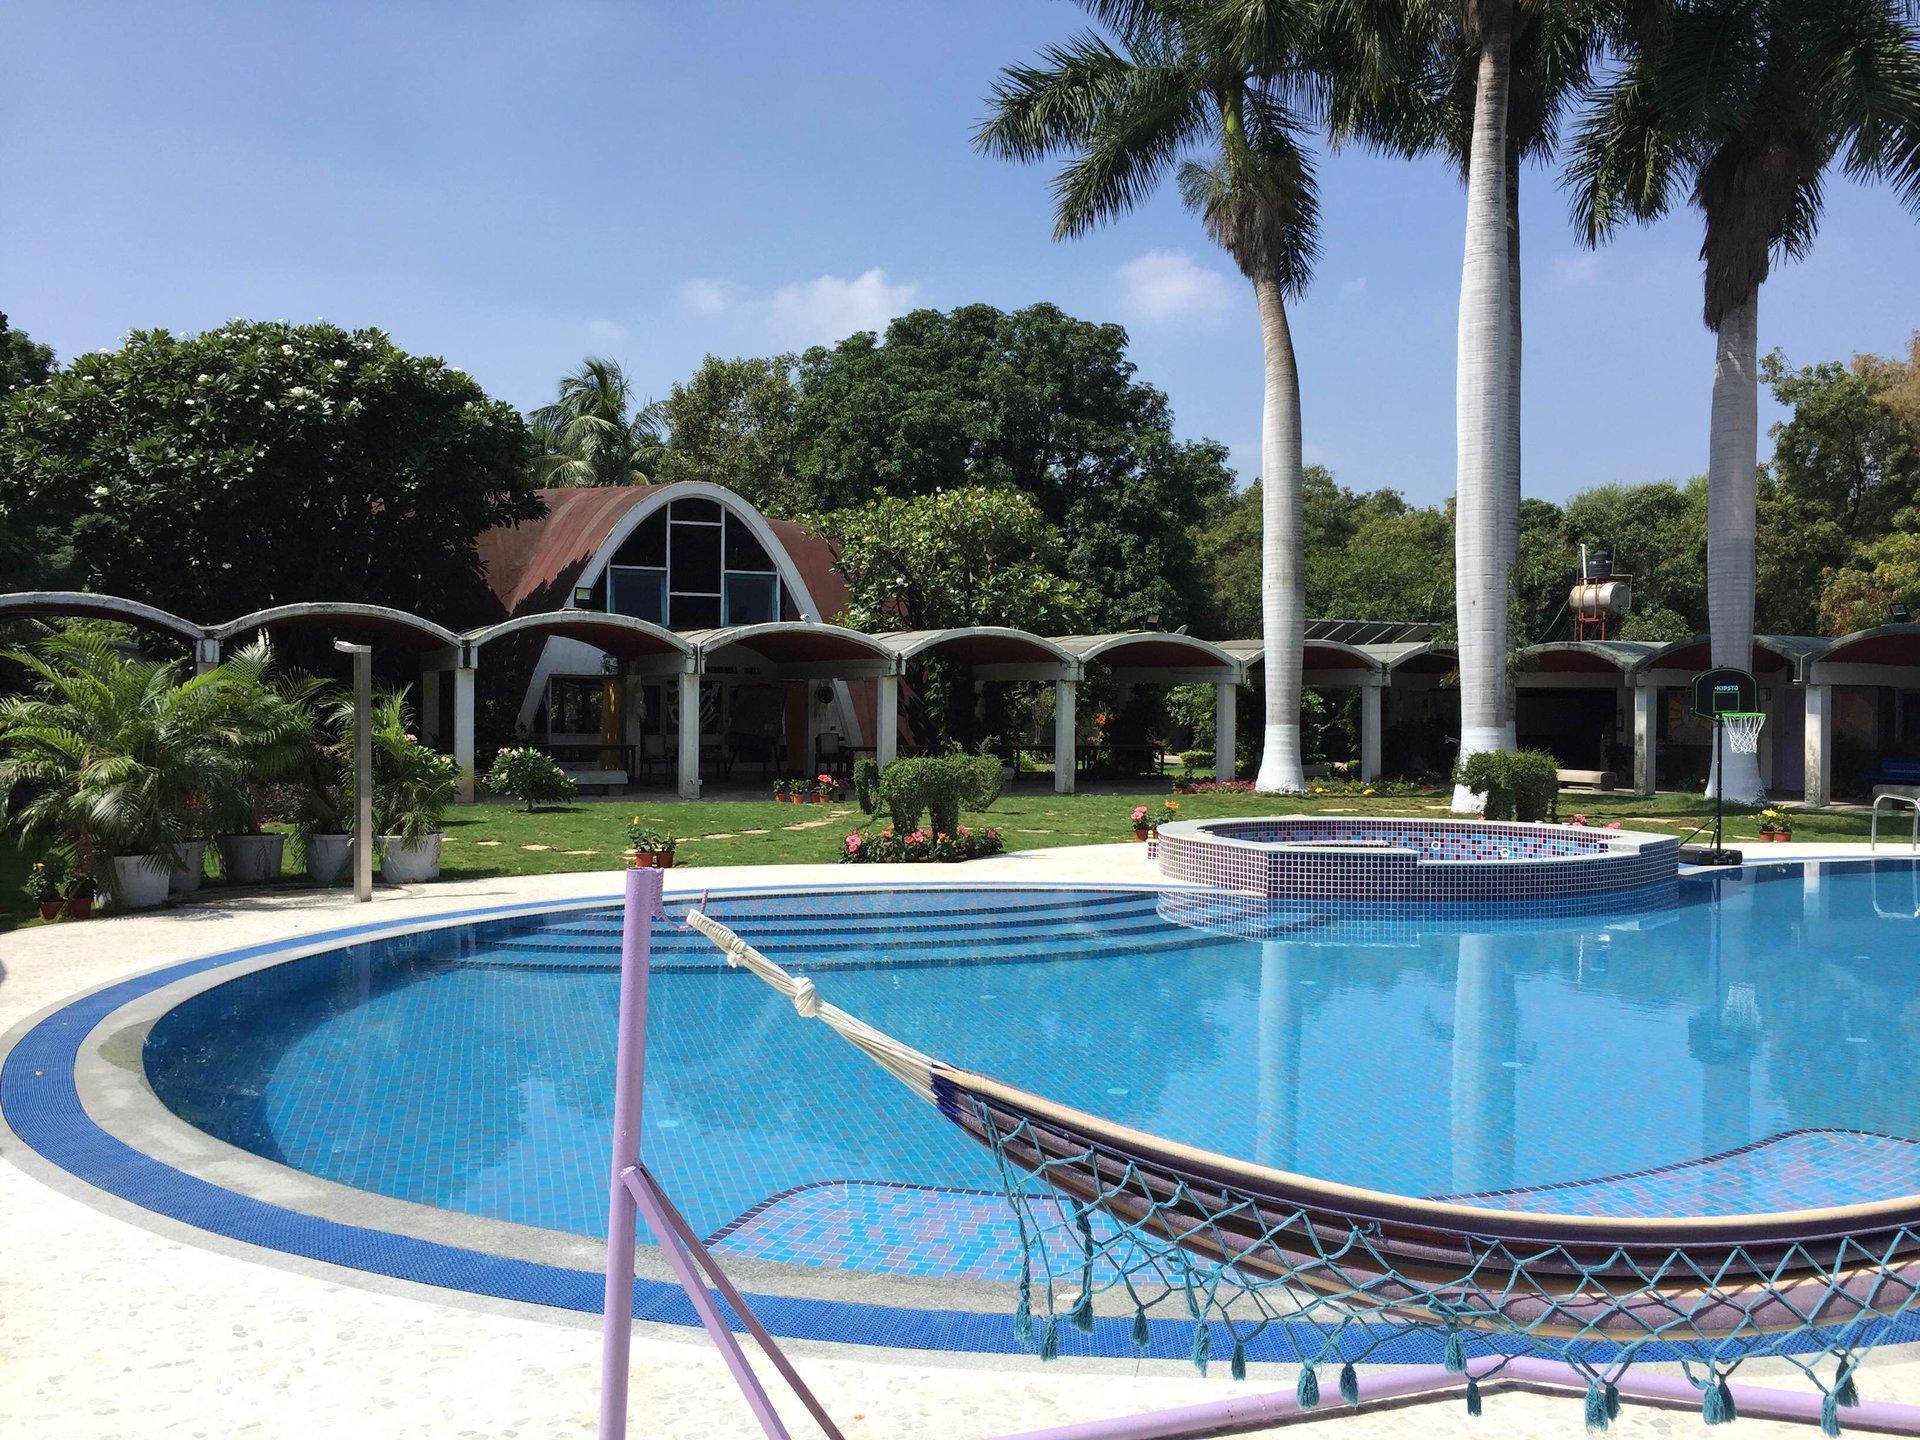 092015_Sangam_Courtyard